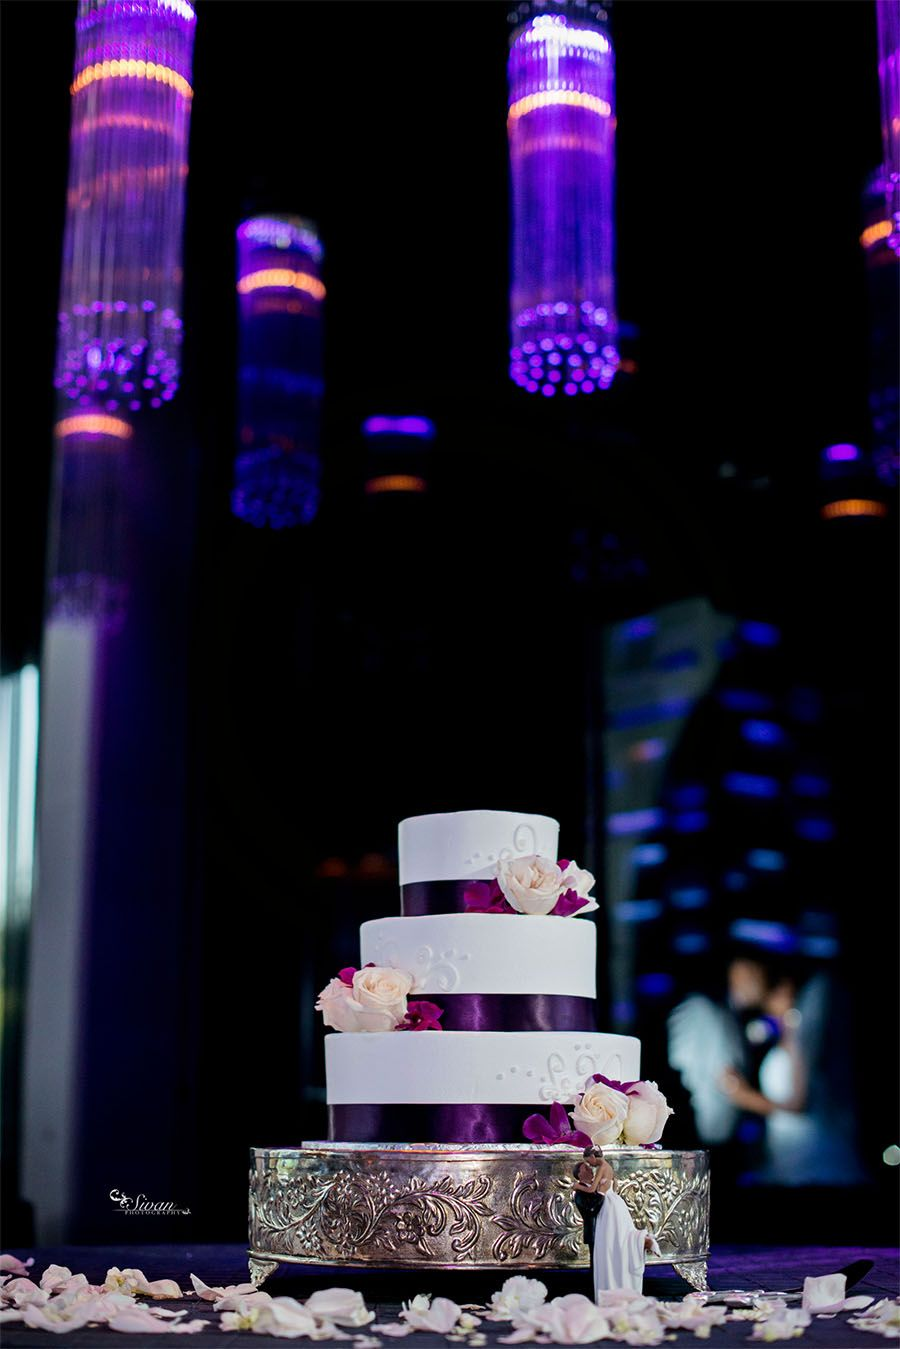 The Mezz Wedding   Sivan Photography   Orlando Wedding Photographer